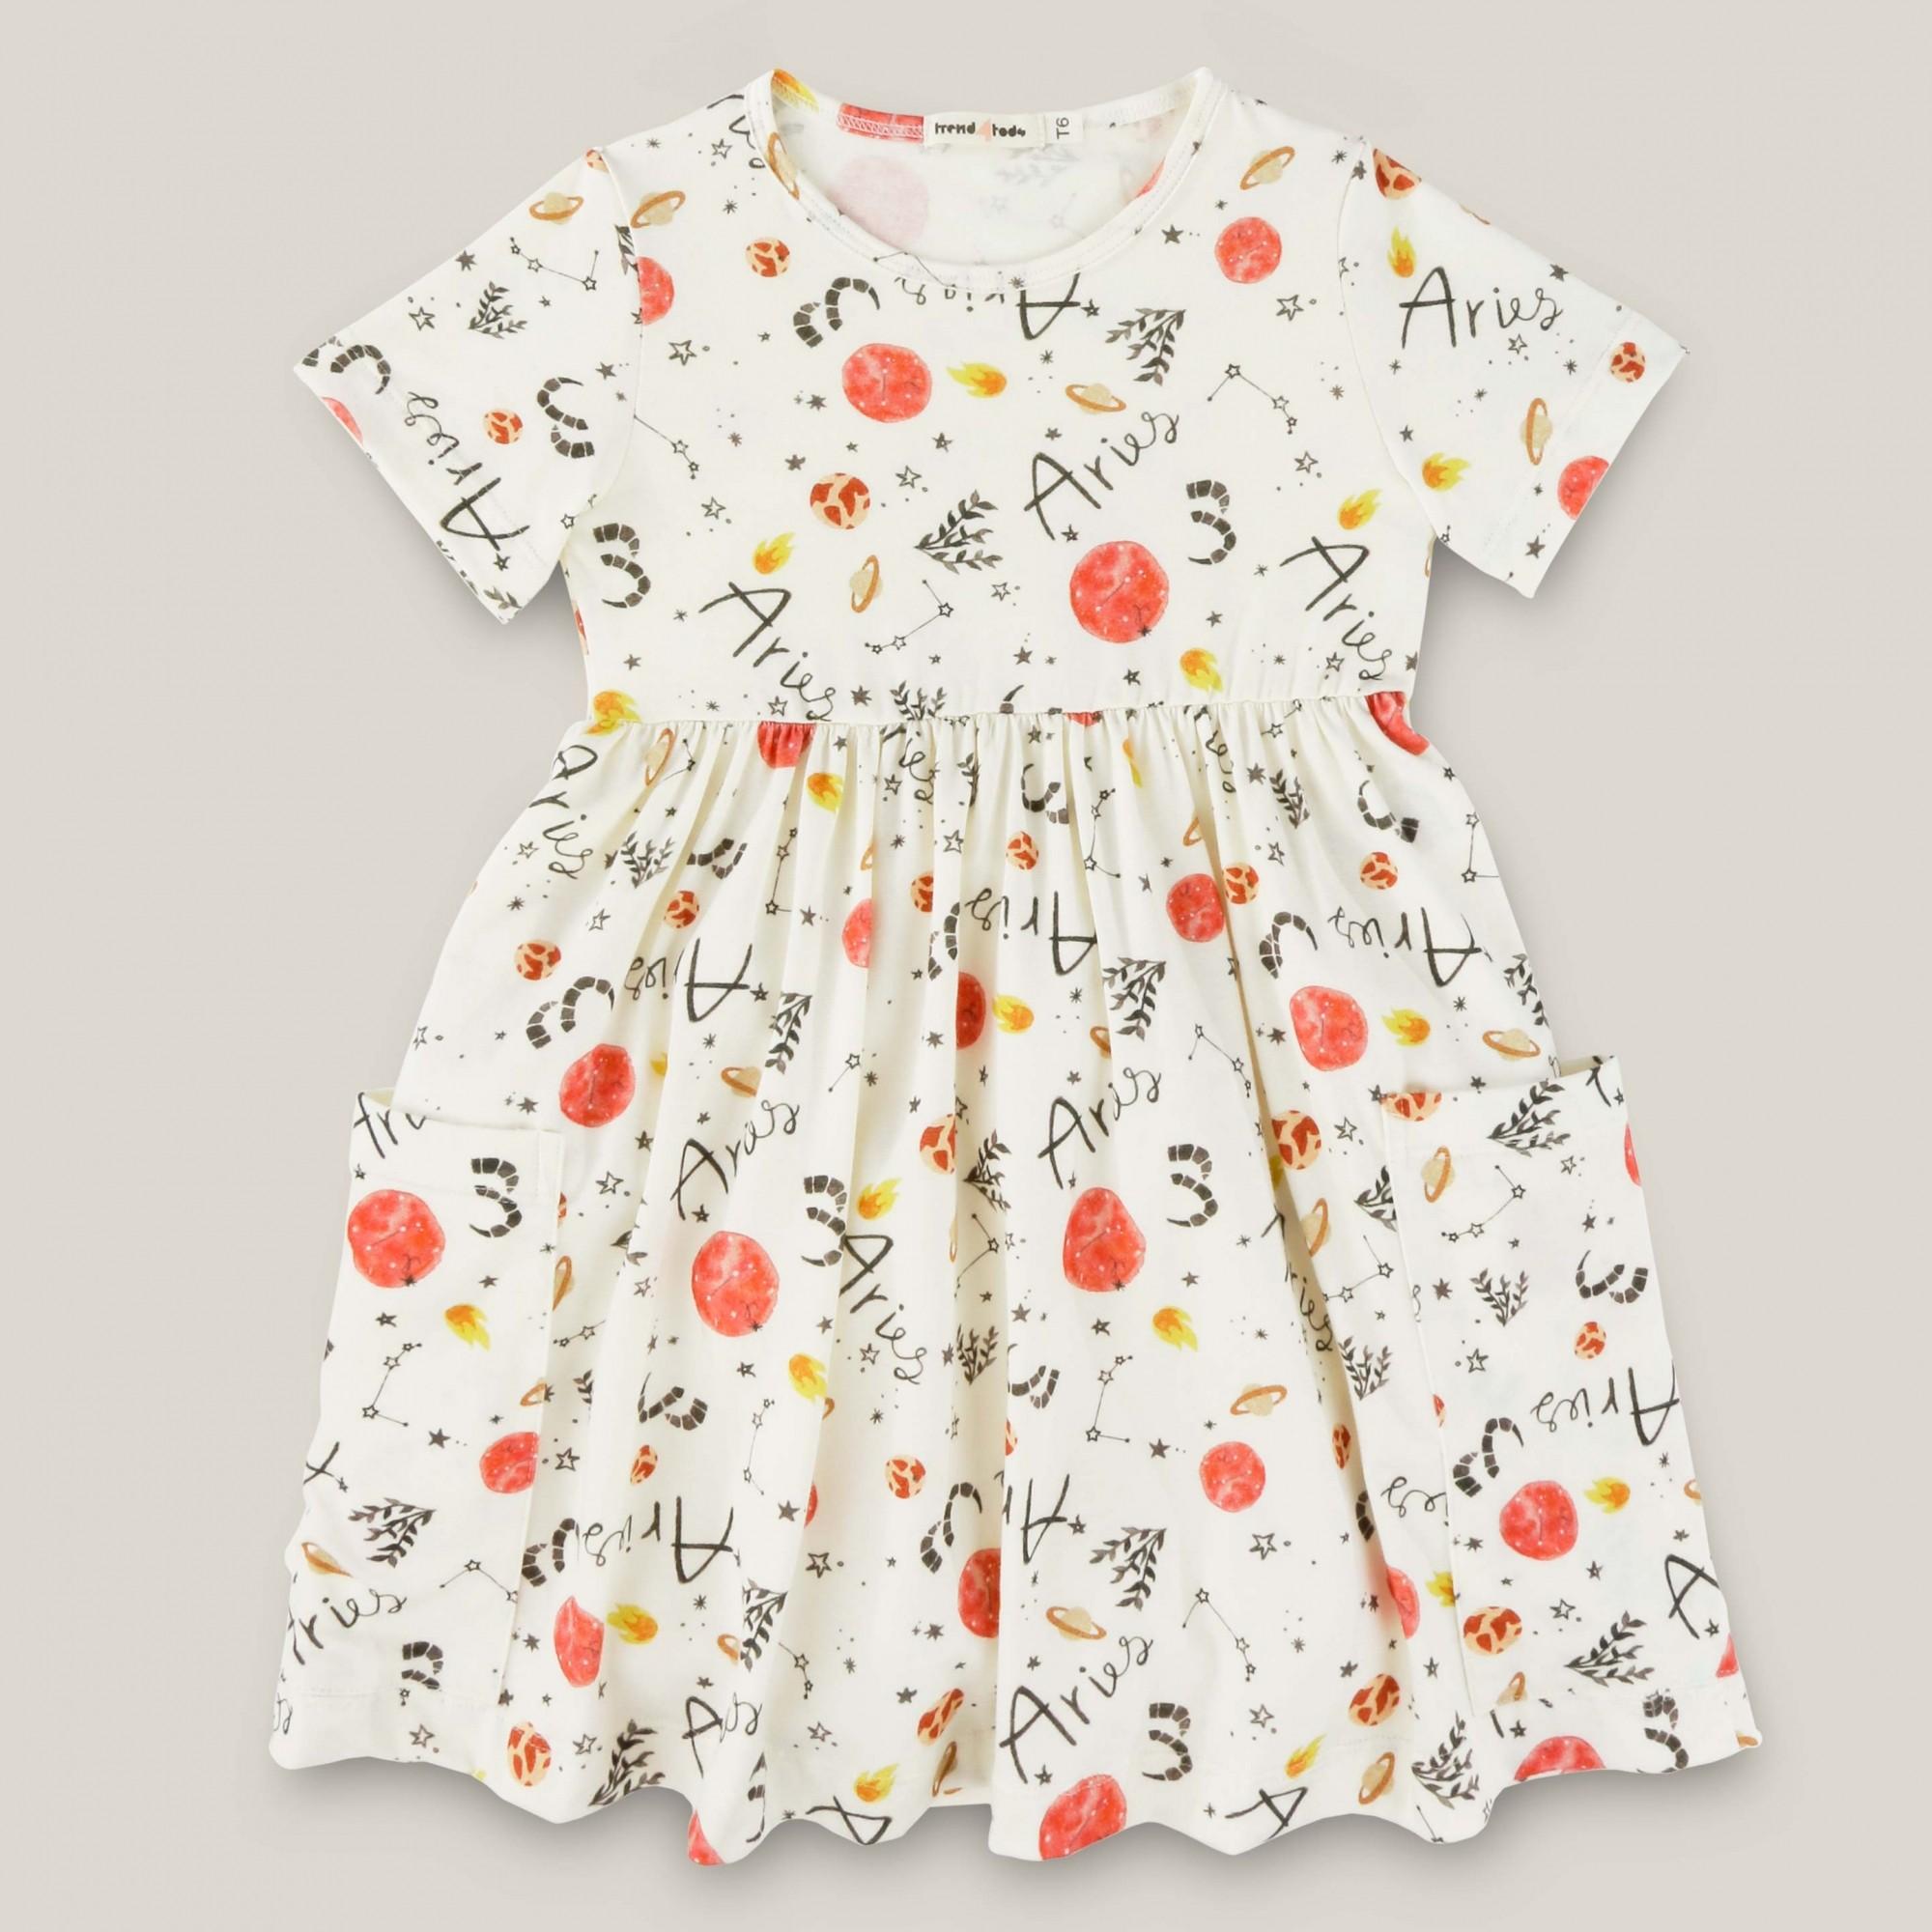 Vestido infantil signo Áries